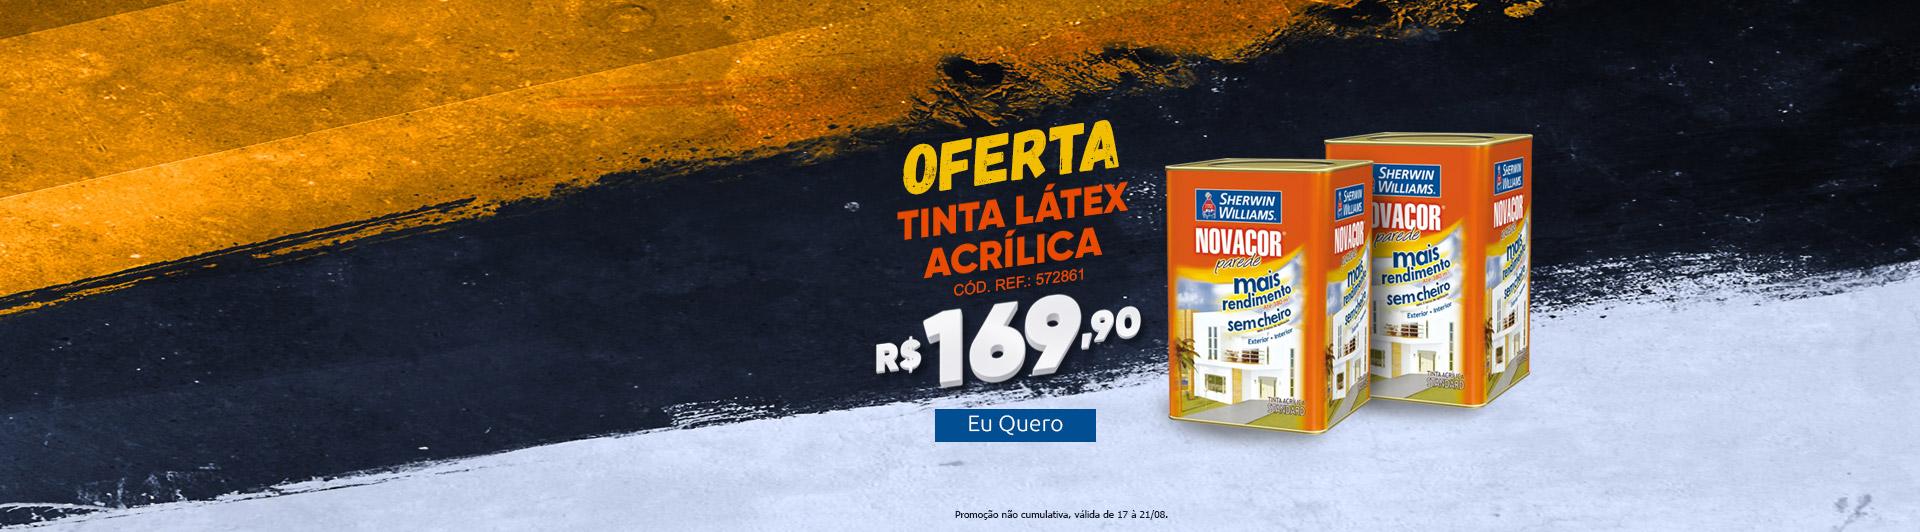 Banner - Oferta TV Tinta